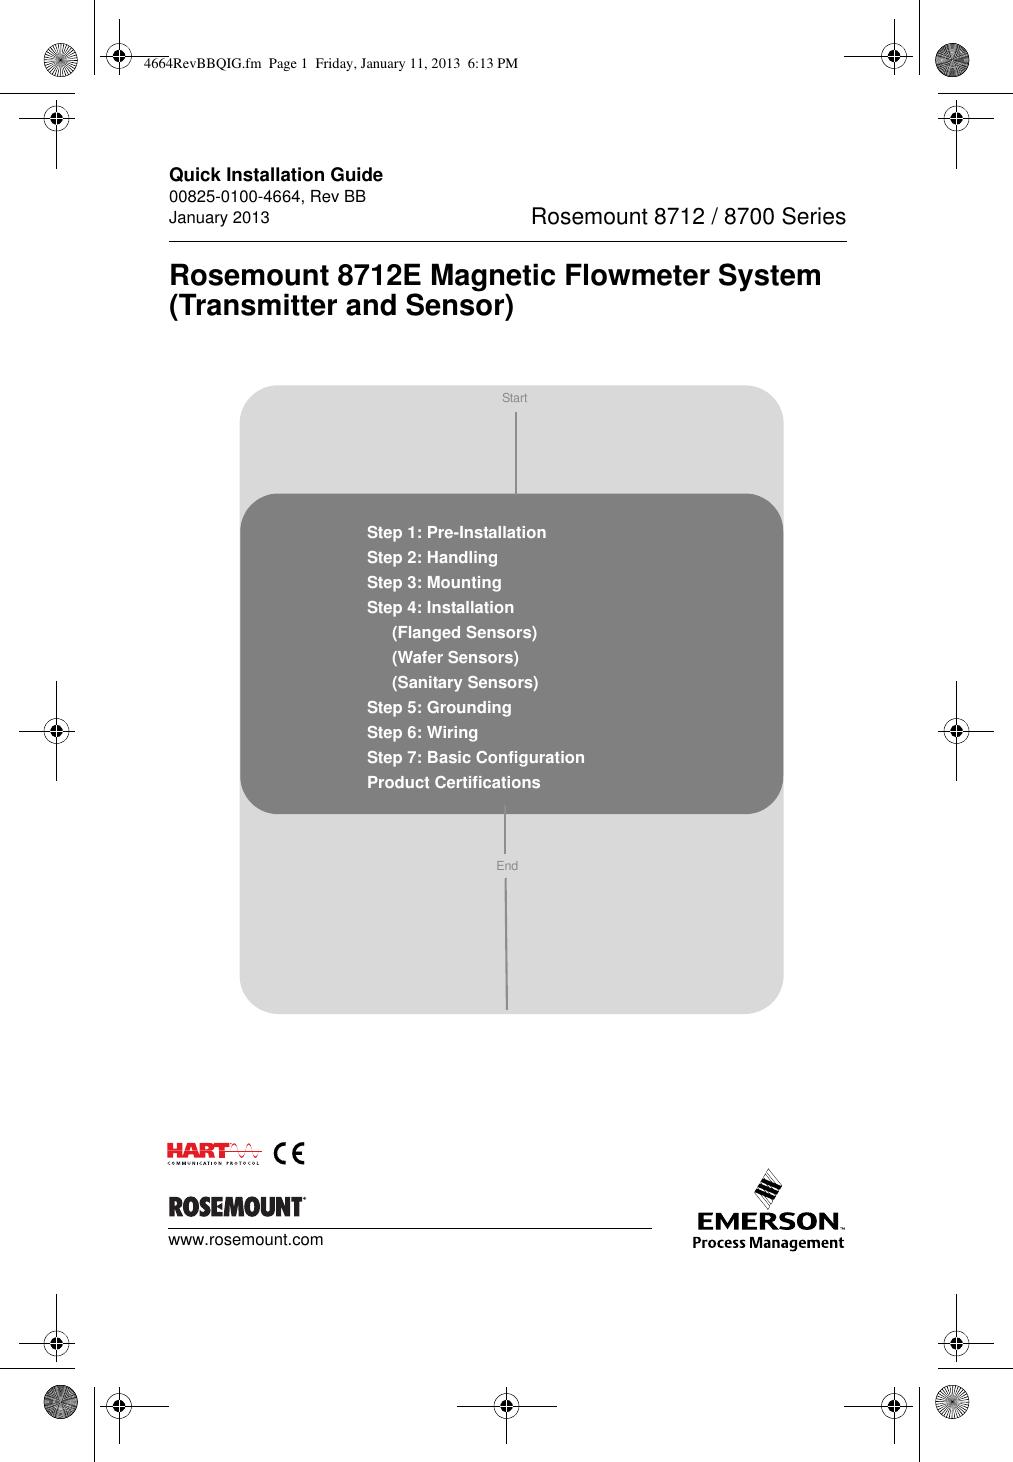 rosemount 1056 ph wiring wiring solutions rh rausco com rosemount 1056 conductivity wiring rosemount analytical 1056 wiring